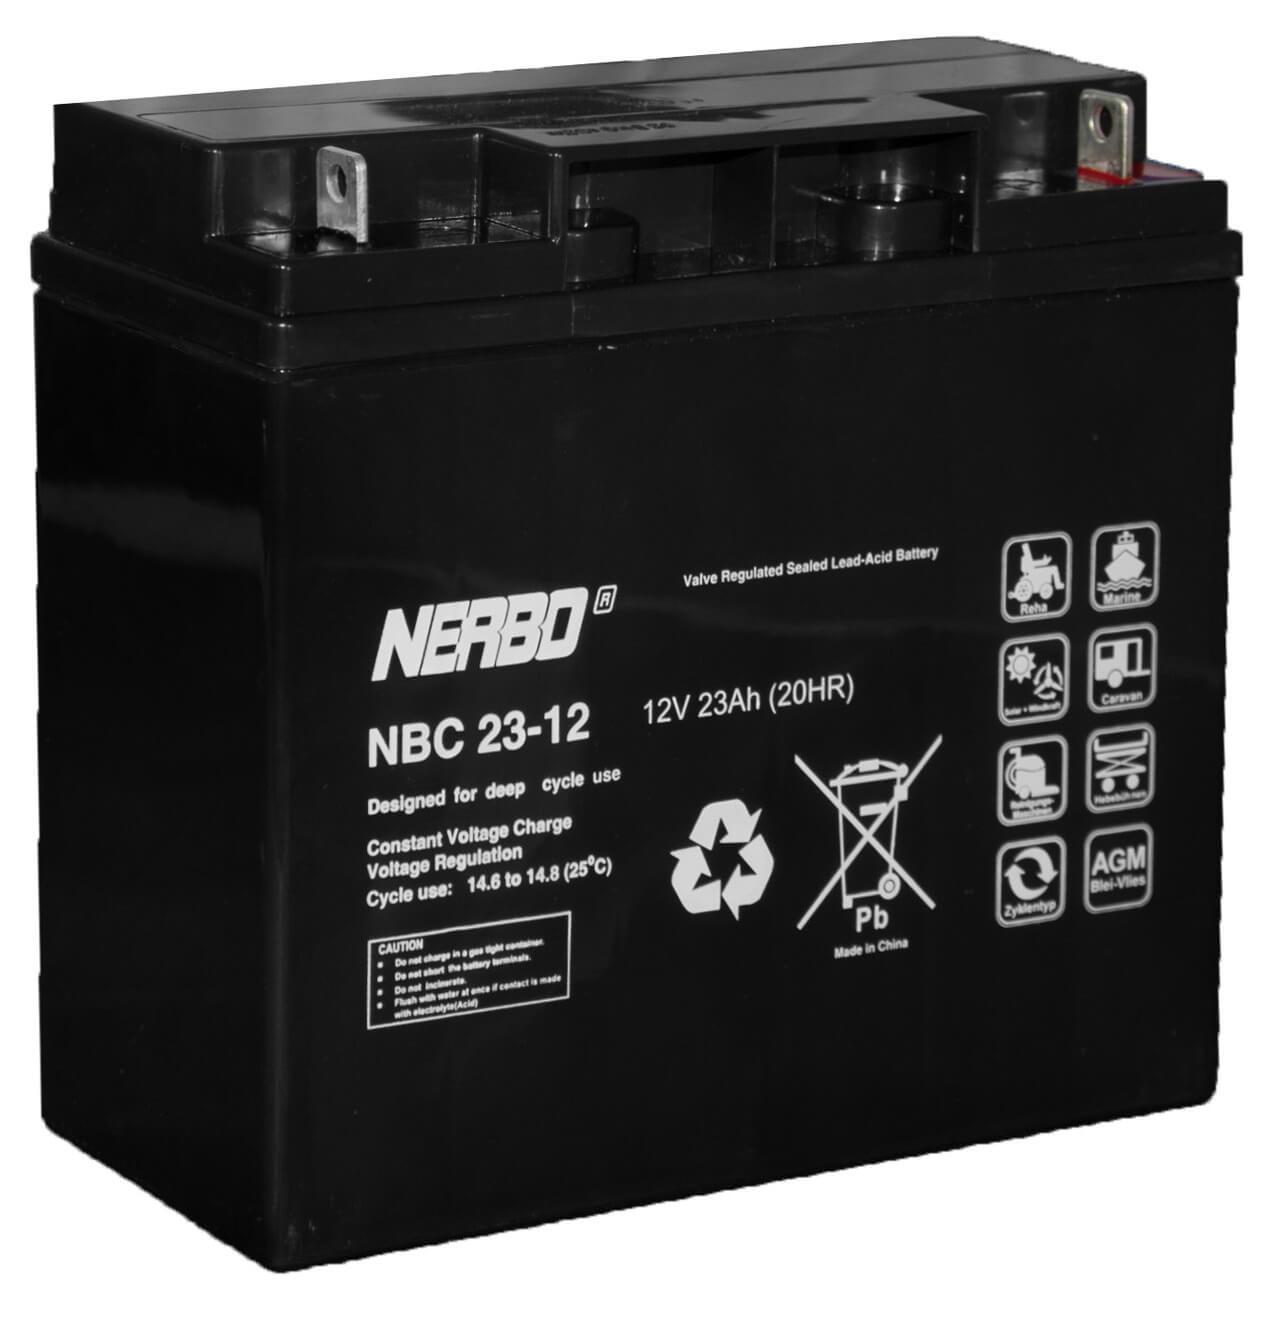 Nerbo NBC 23-12 - 12V 23Ah VRLA-AGM Akku Batterie Zyklentyp